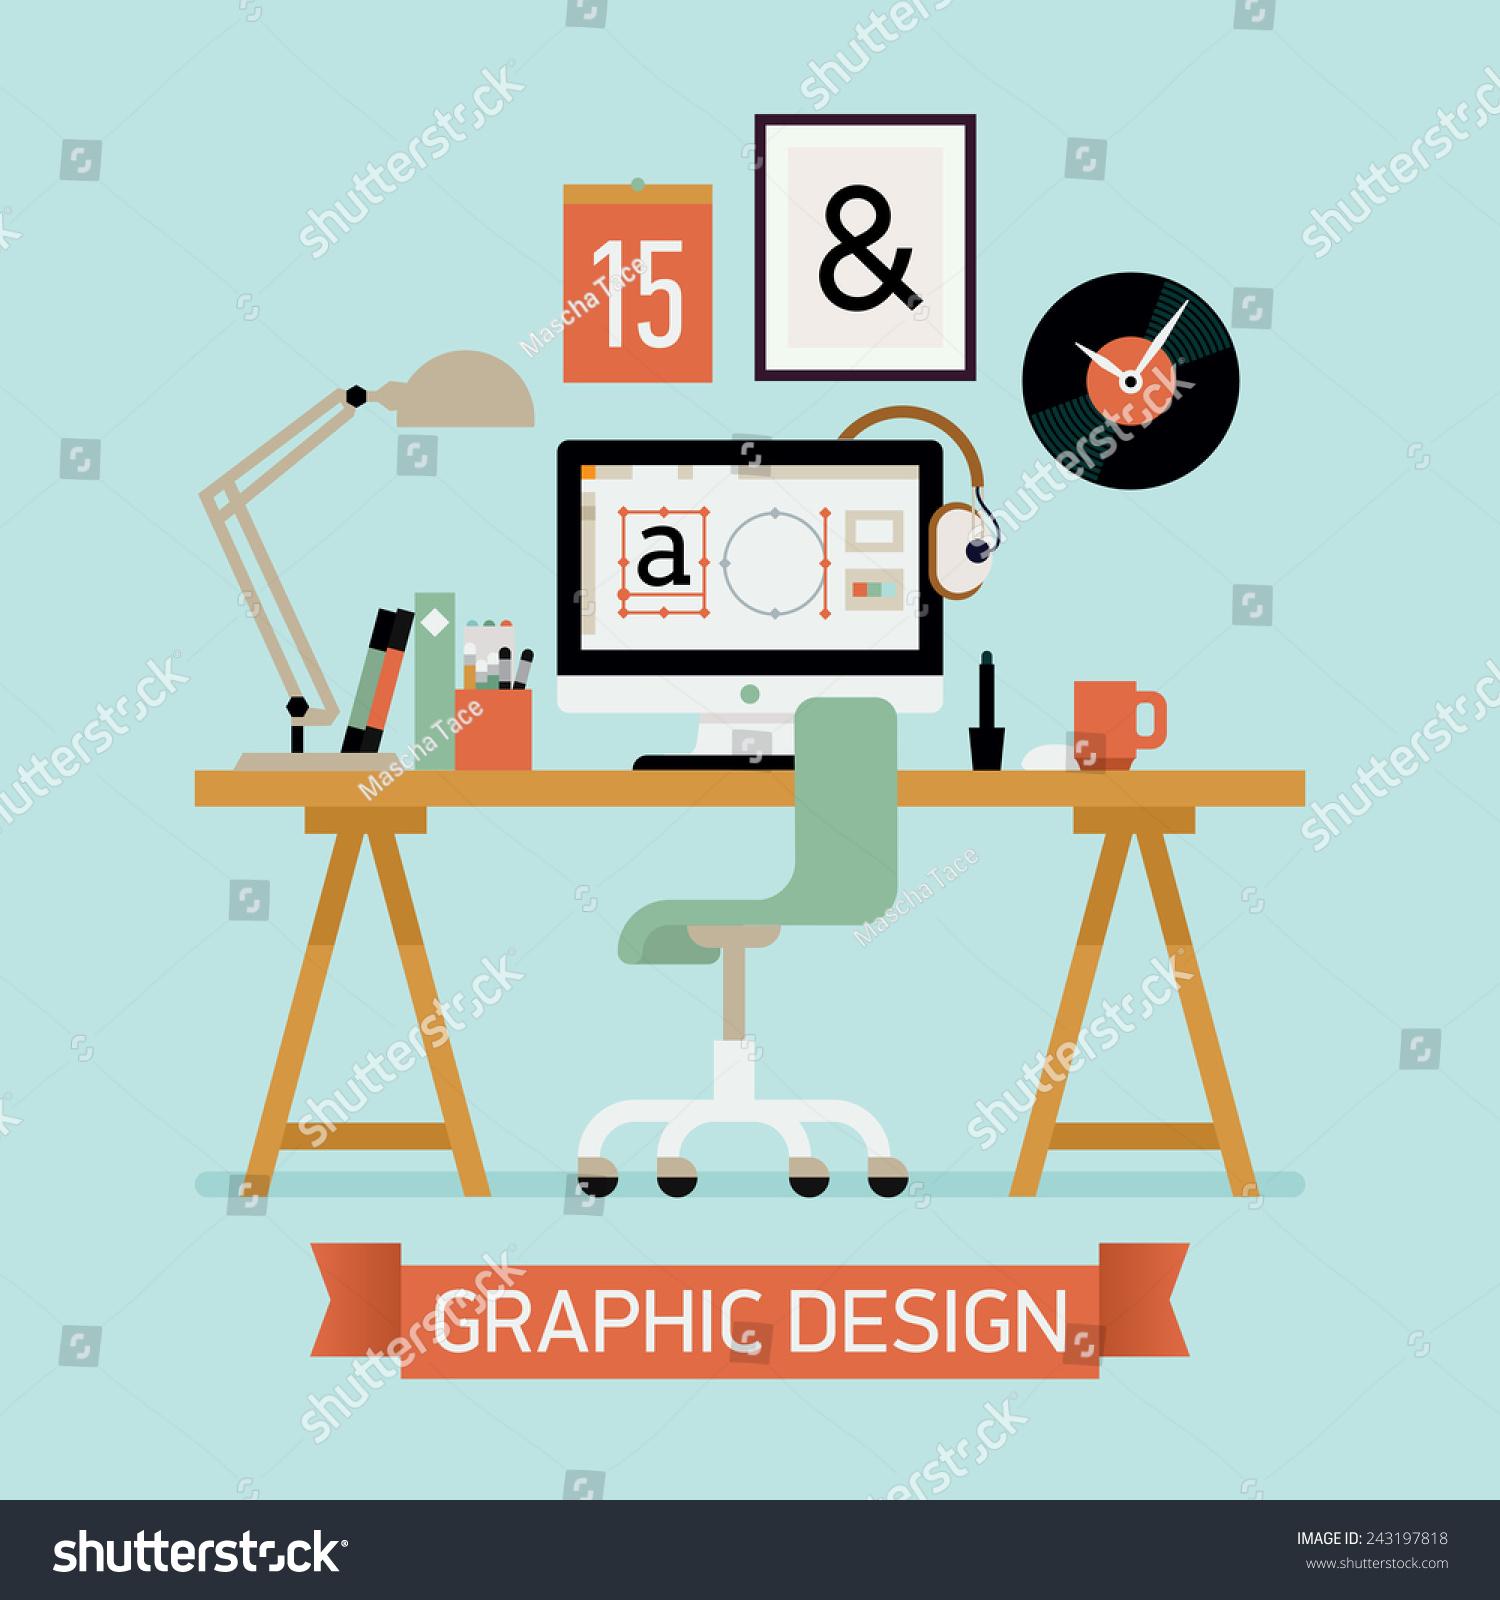 Vector Modern Flat Concept Design On Graphic Designer